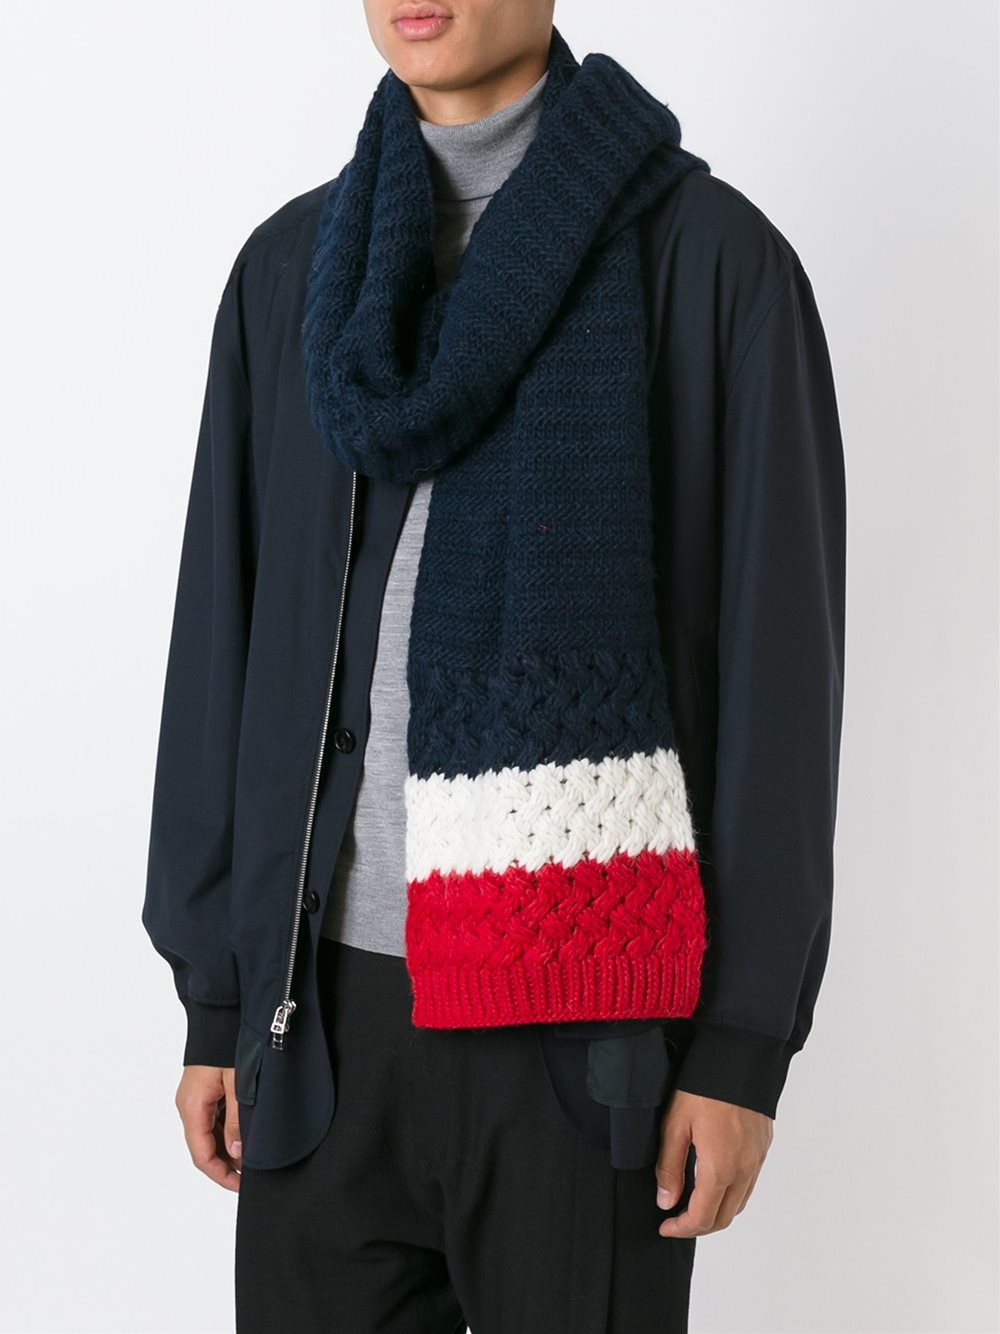 201610_Menz_must-see_muffler_scarf_popular_brand_050